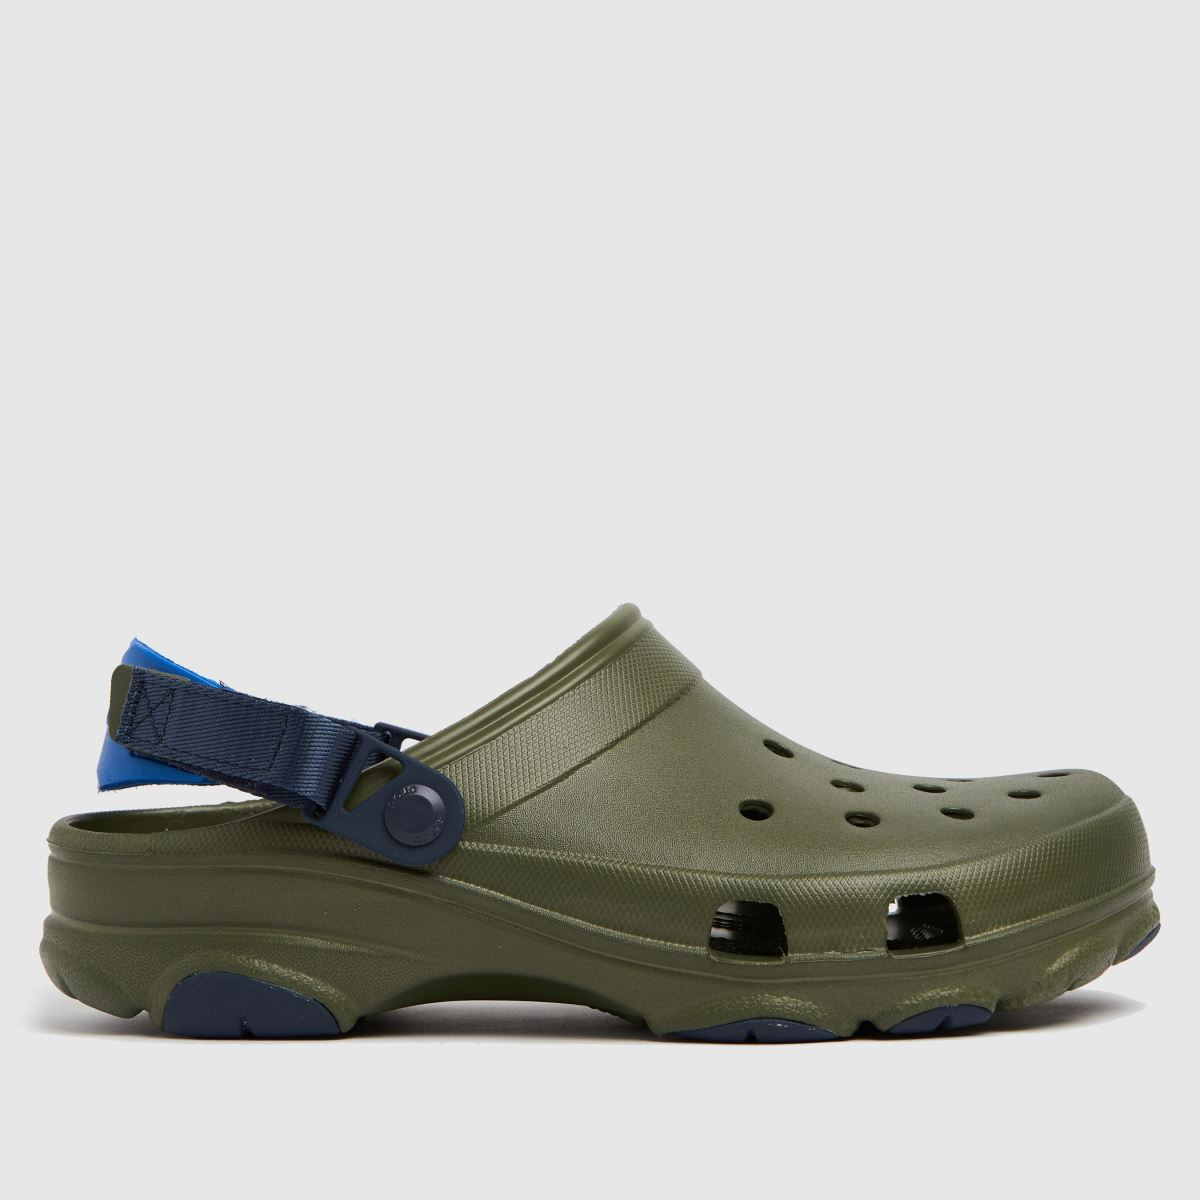 Crocs Khaki Classic All Terrain Sandals